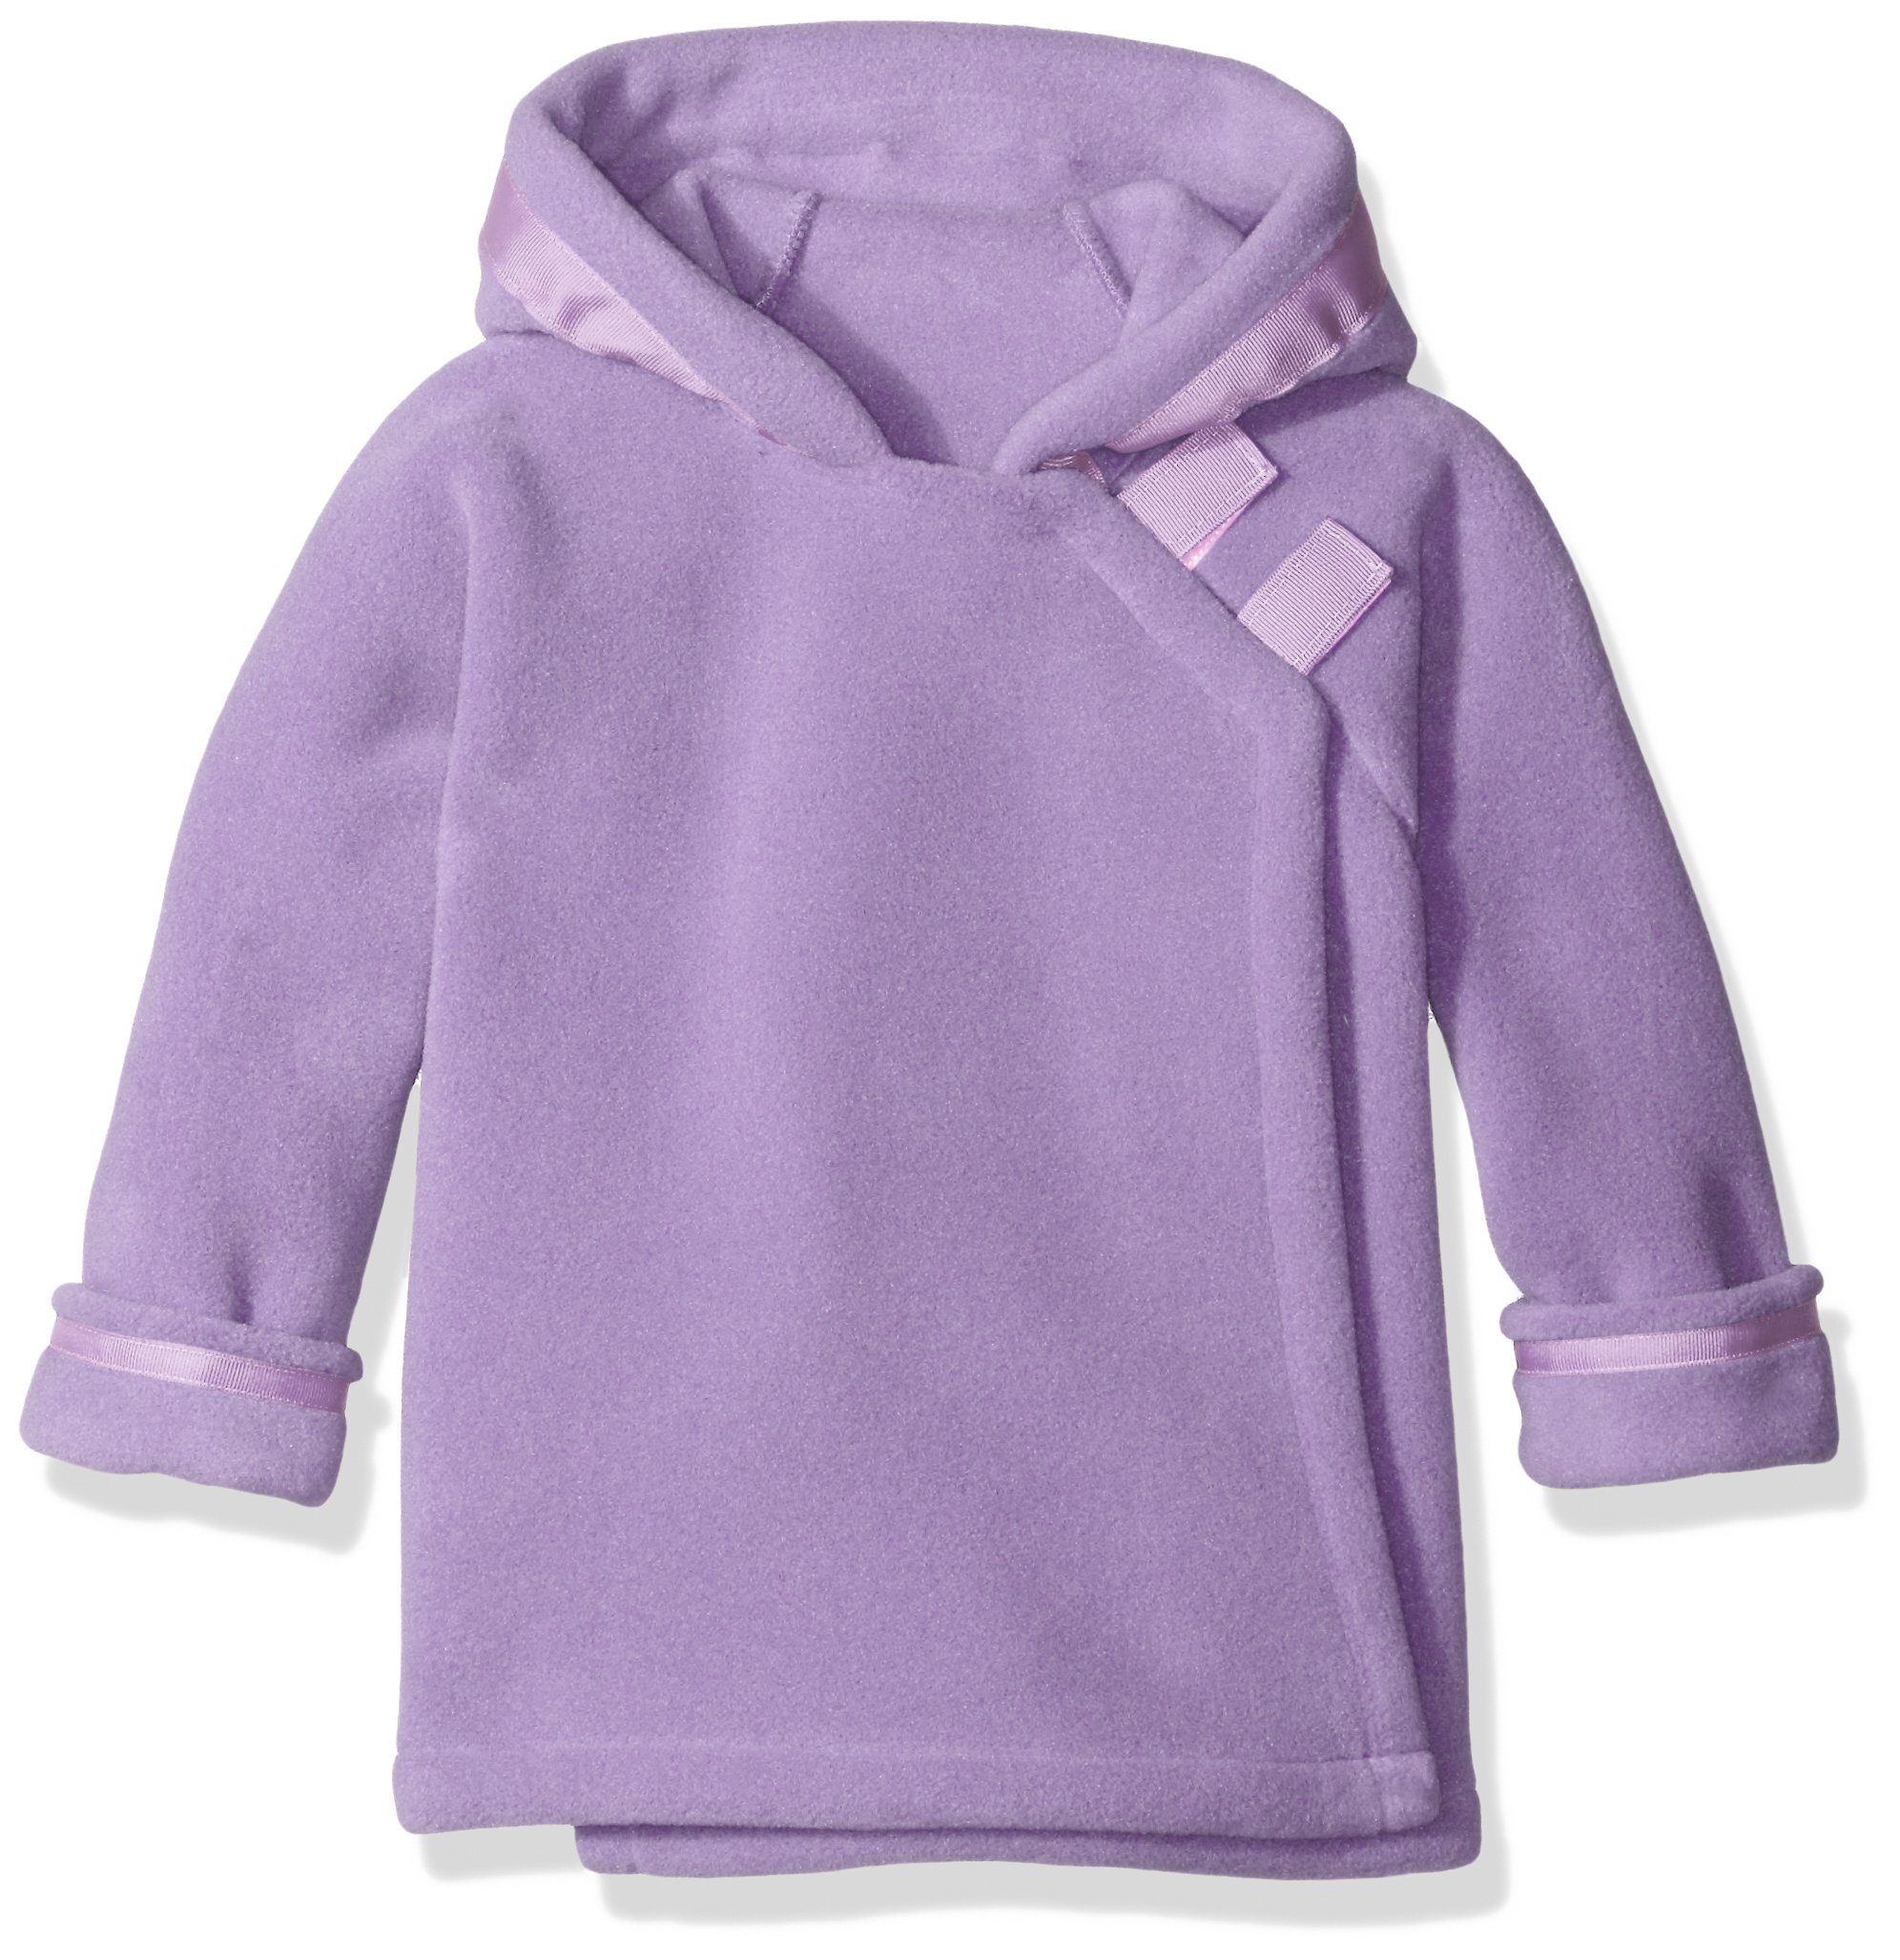 Widgeon Baby Hooded Toggle Sweater Coat Cksslate Grey 4